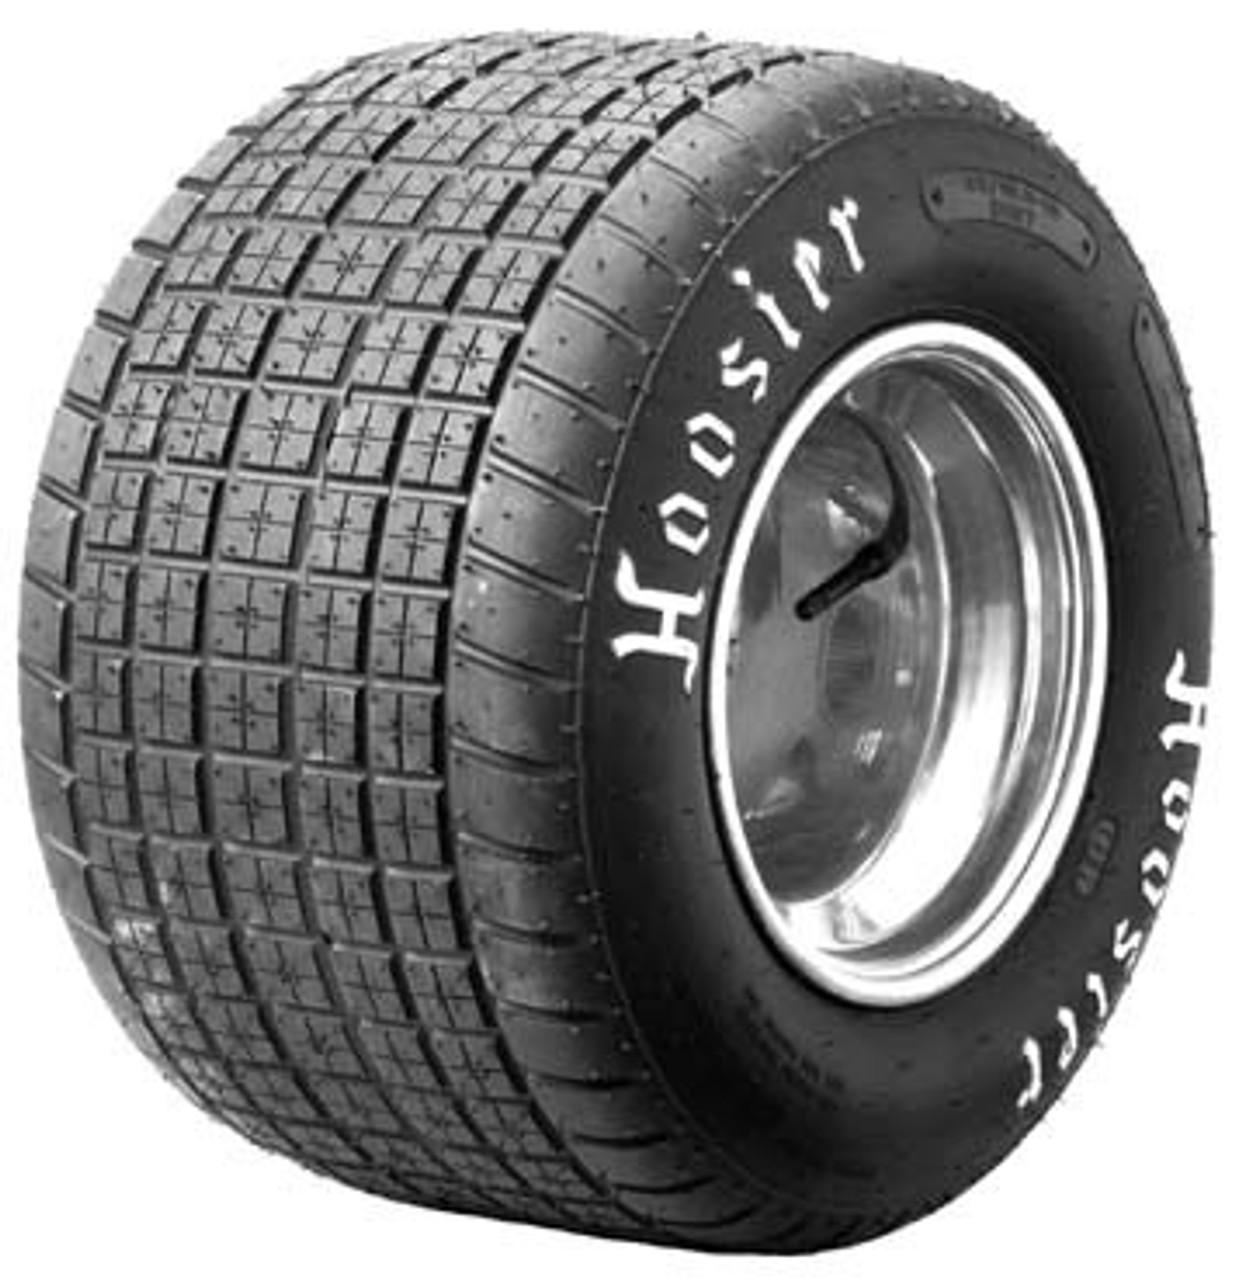 Hoosier ATV Tire